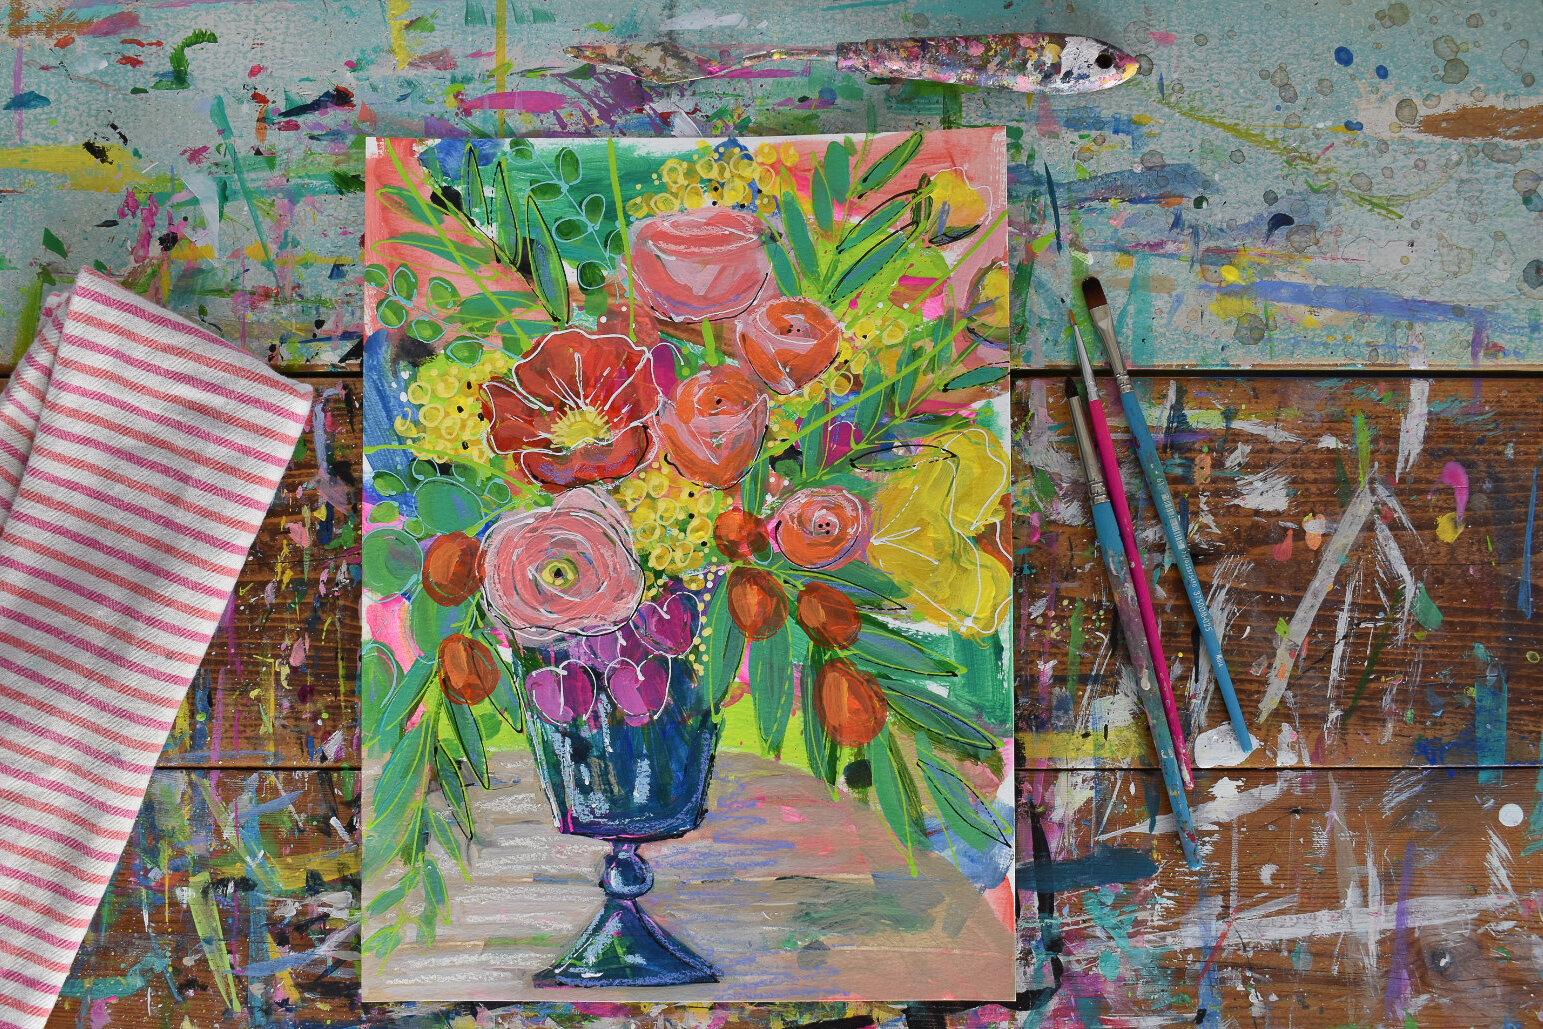 boho_flowers_painting_eclectic_tropical_daisyfaithart_4.jpg